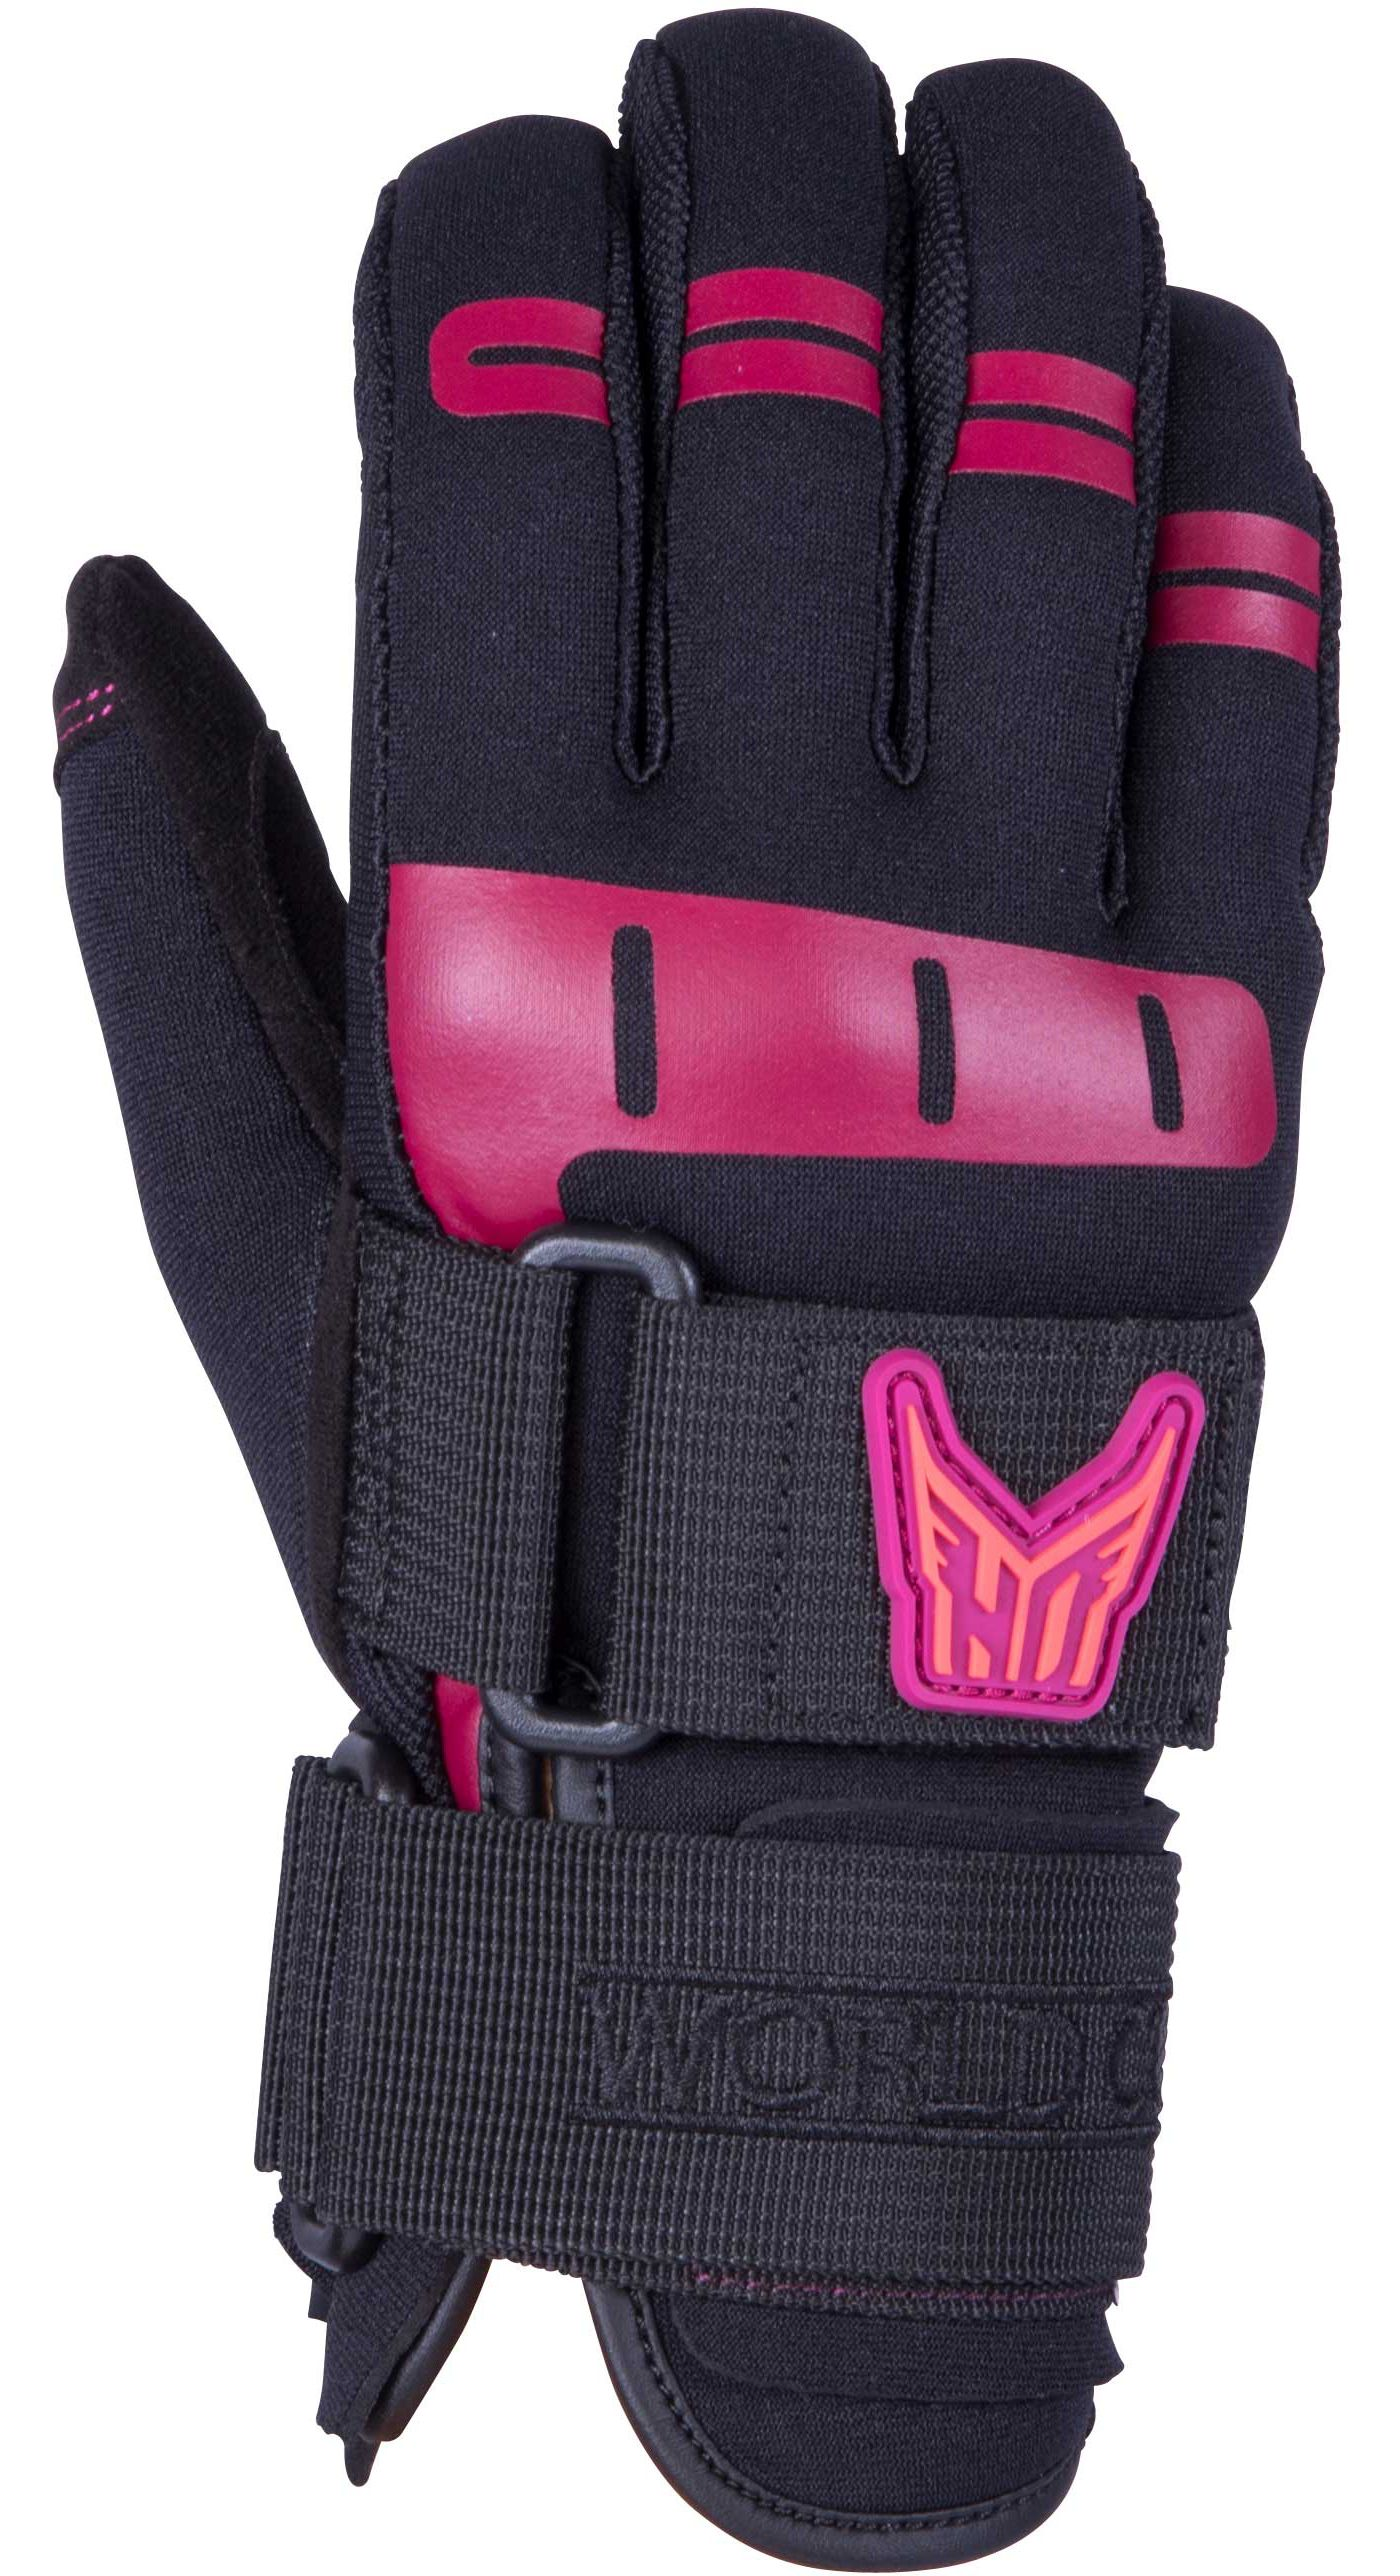 HO Sports Women's World Cup Water Ski Gloves